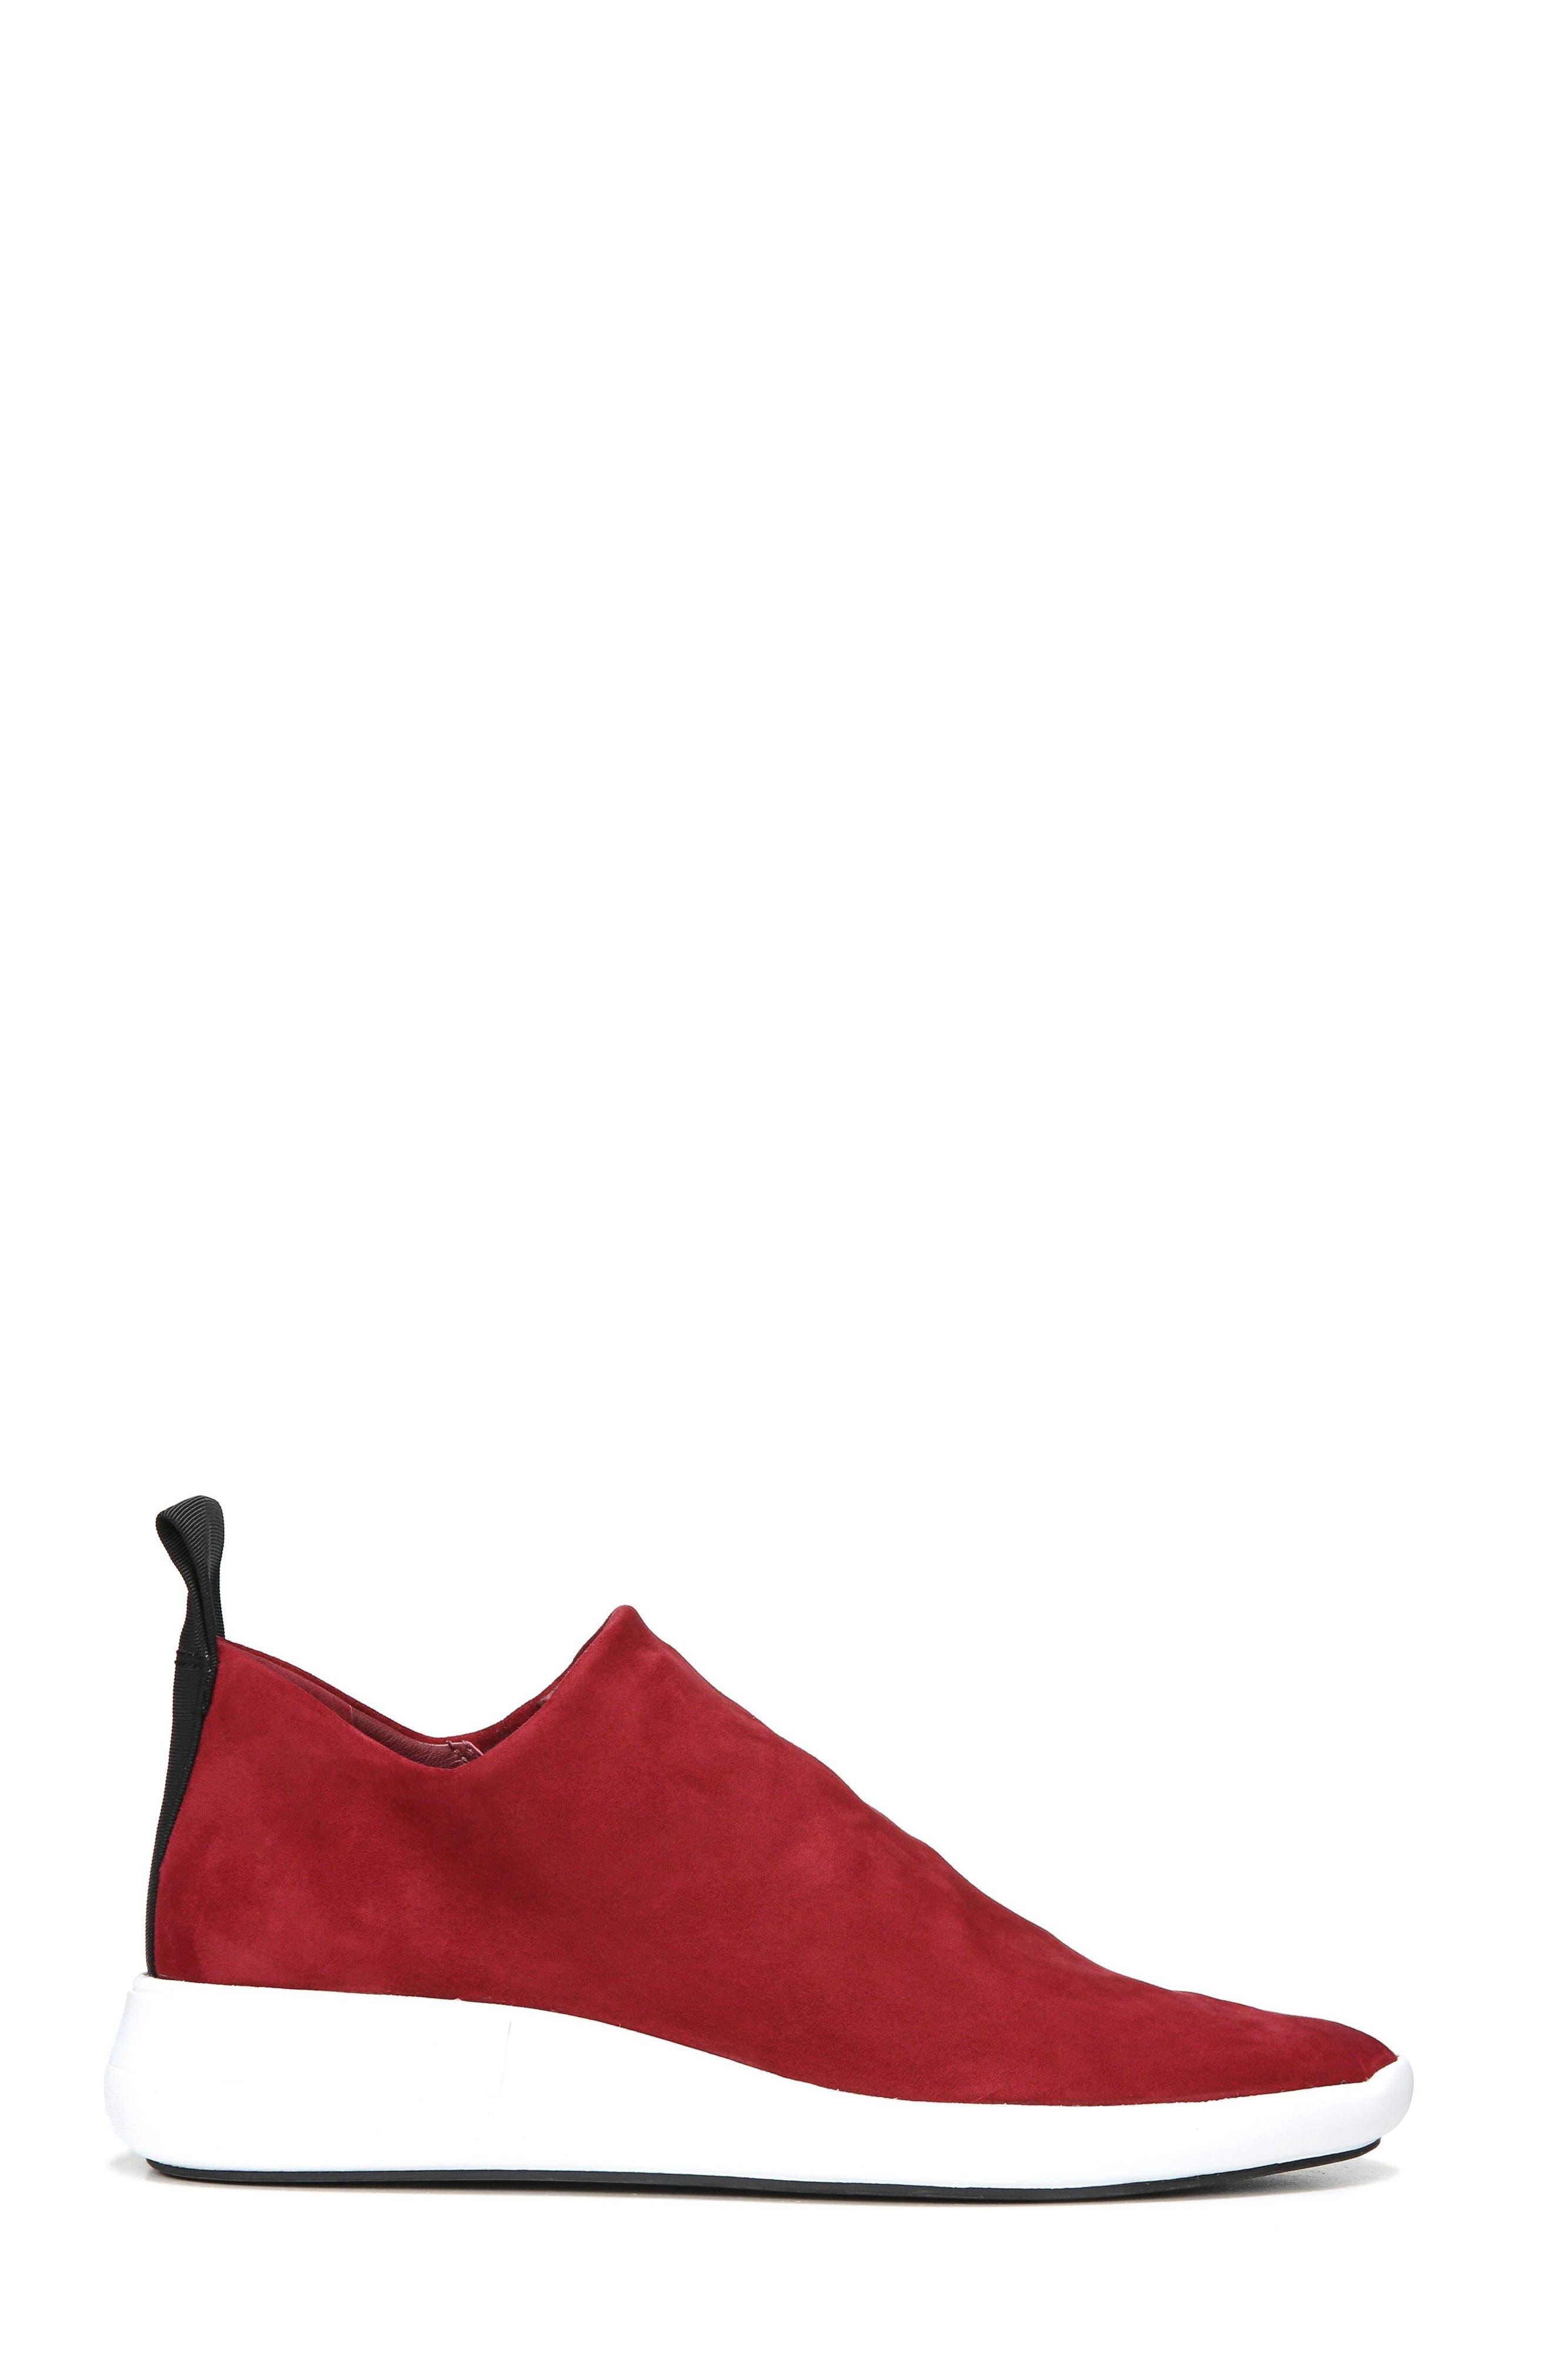 Marlow Slip-On Sneaker,                             Alternate thumbnail 3, color,                             Ruby Suede